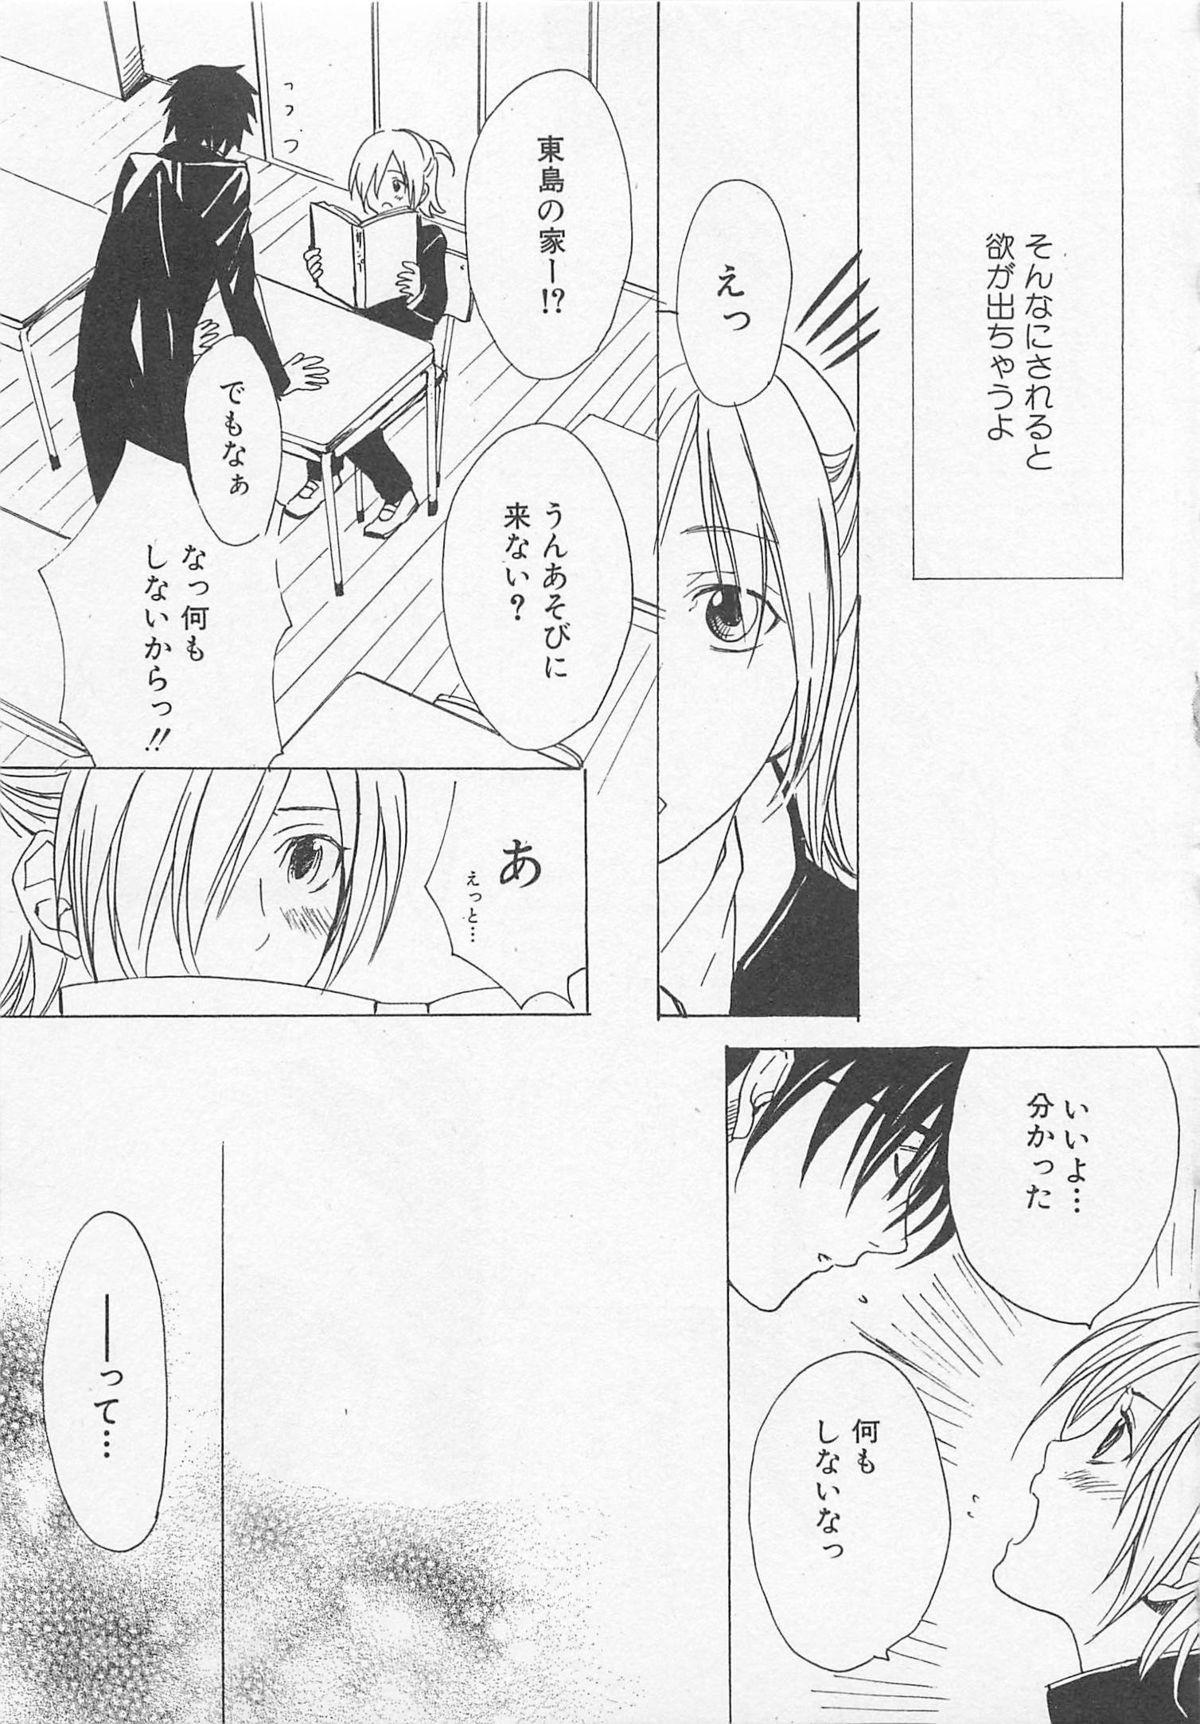 Shounentachi Vol. 2 49